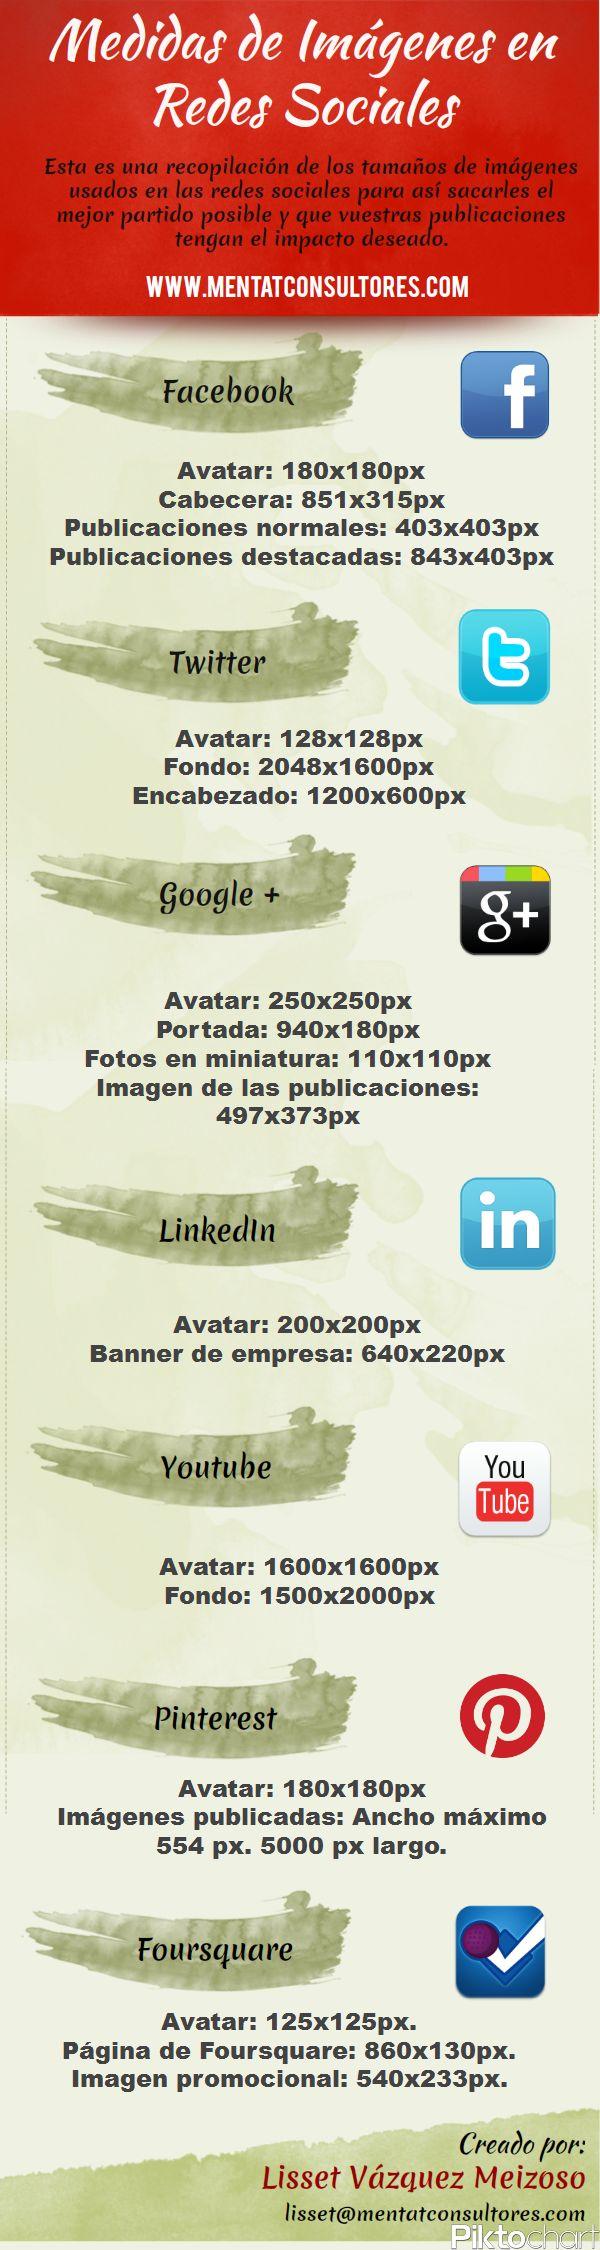 Infografia tamaño de las imágenes en las redes sociales. Lisset Vázquez Meizoso.